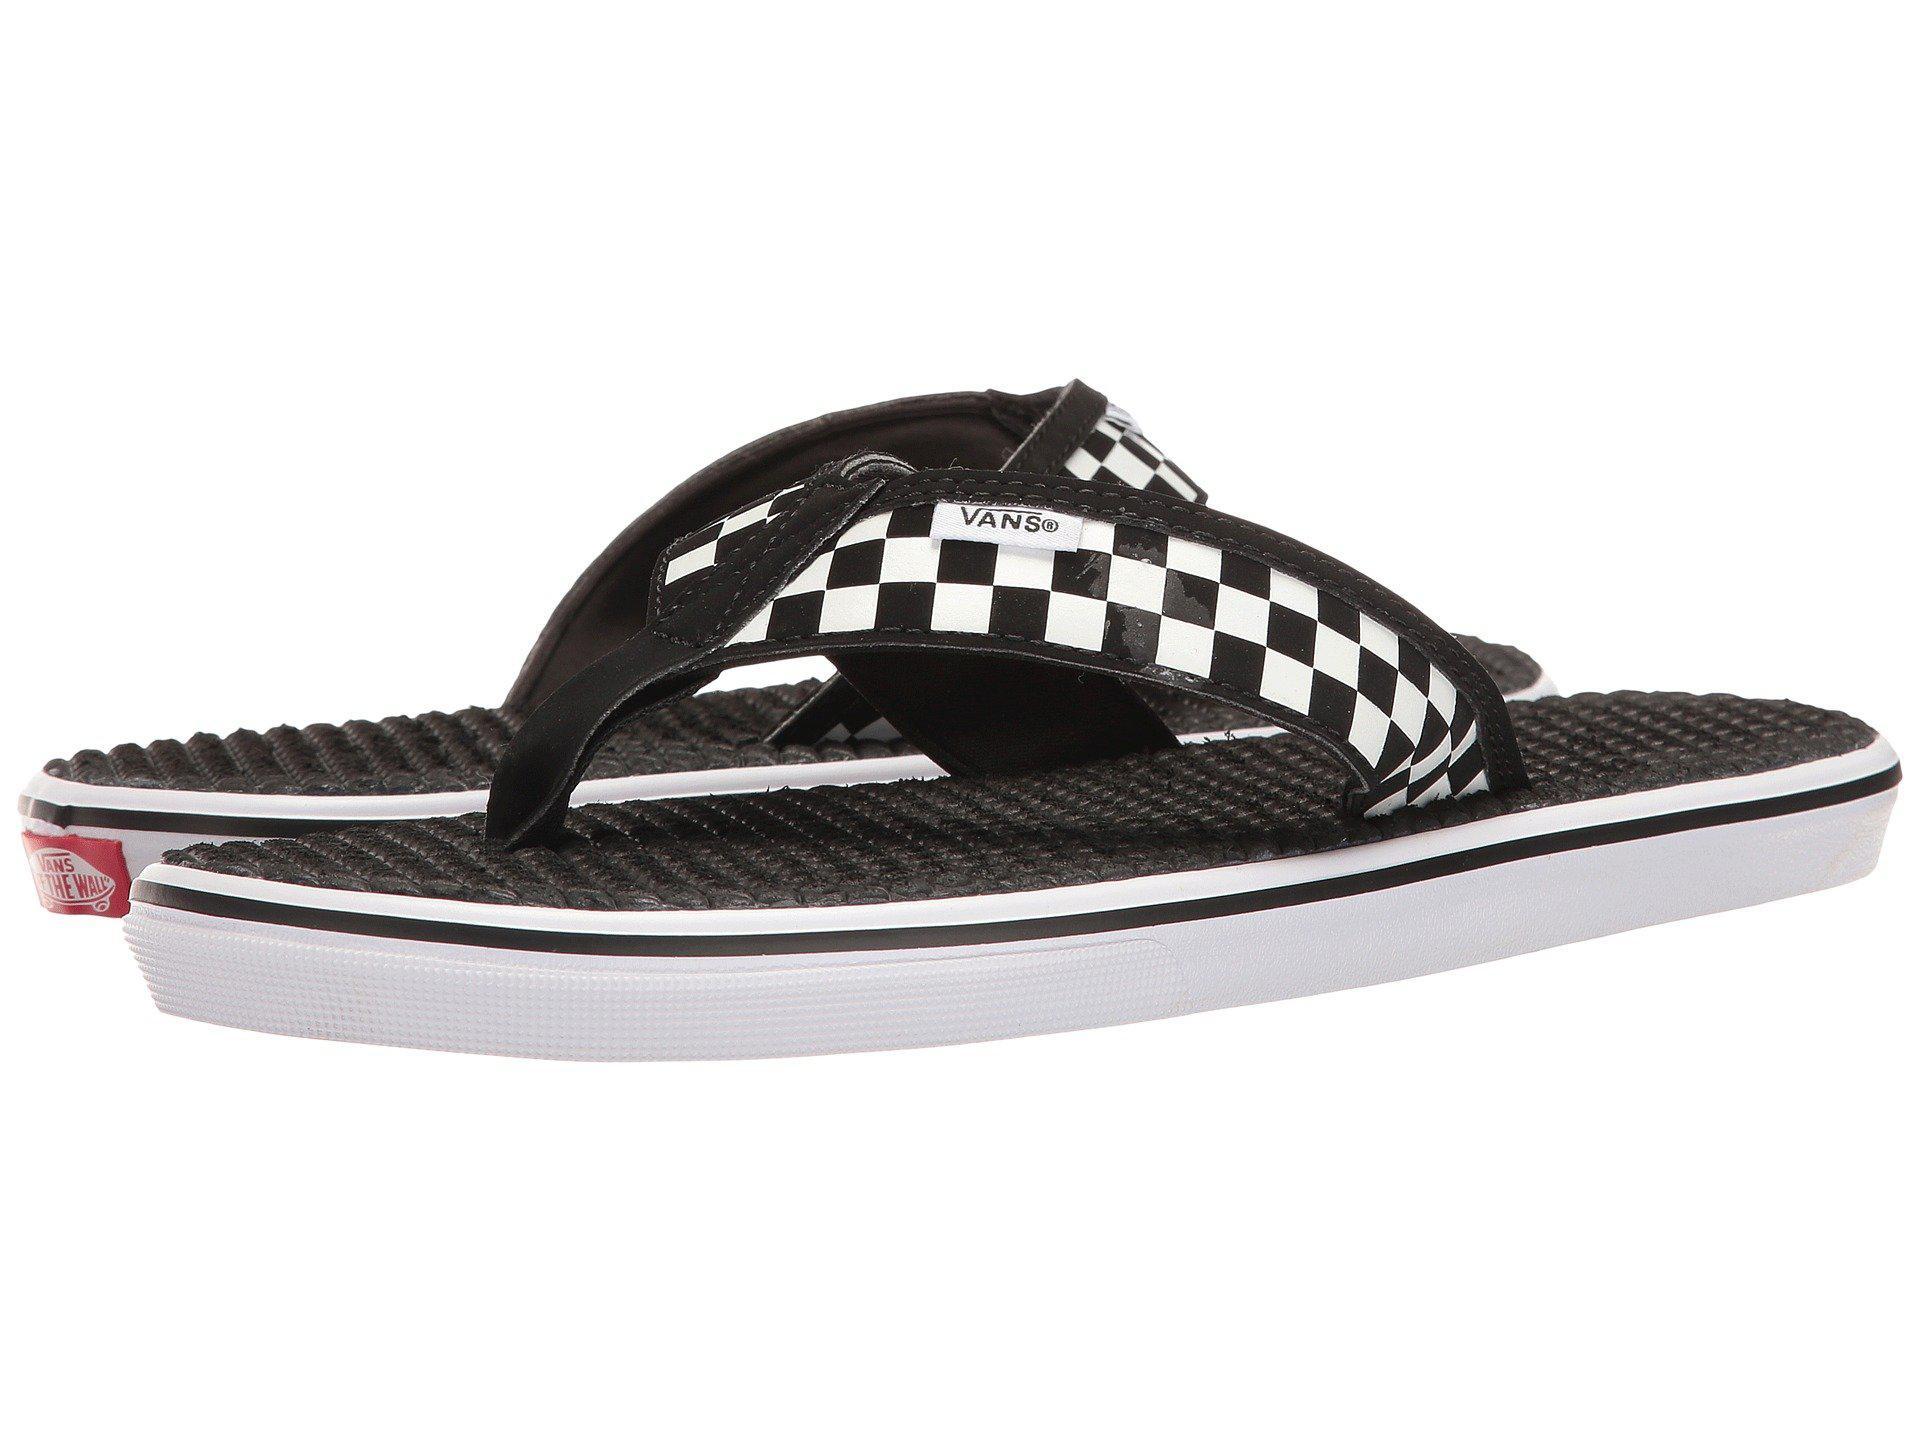 29382426983 Vans - La Costa Lite ((checkerboard) Black white) Men s Sandals for. View  fullscreen